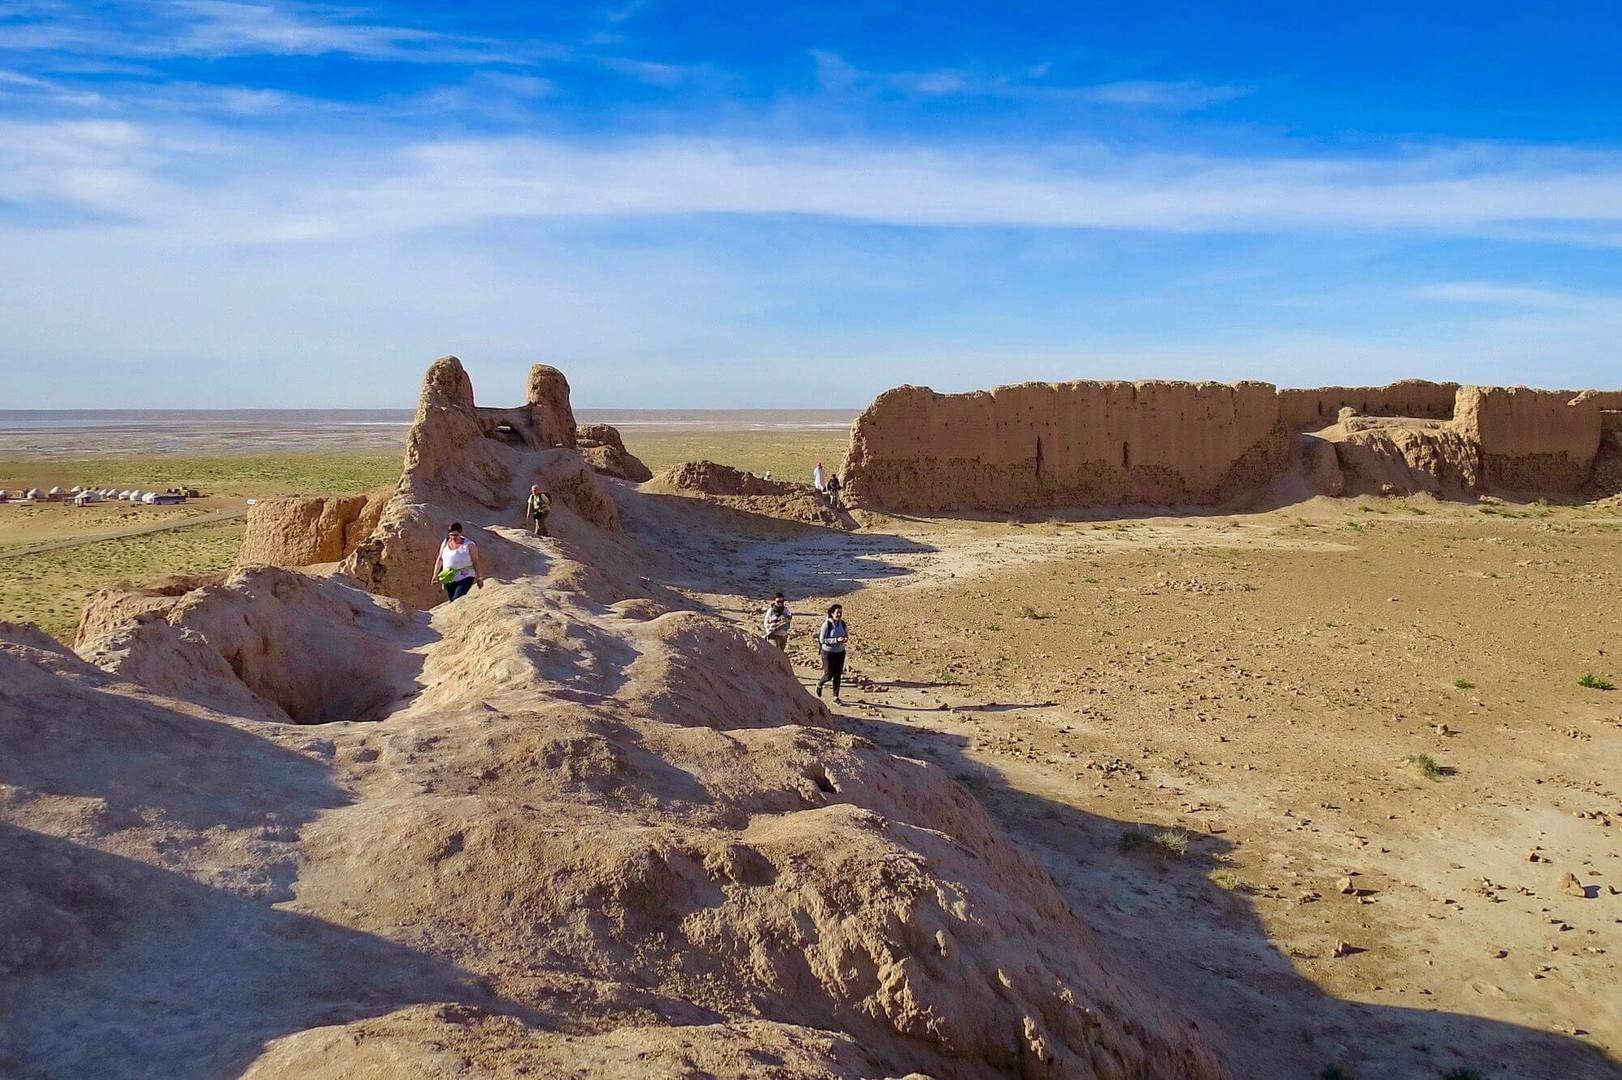 Ayaz Kala Ausgrabungen in Usbekistan